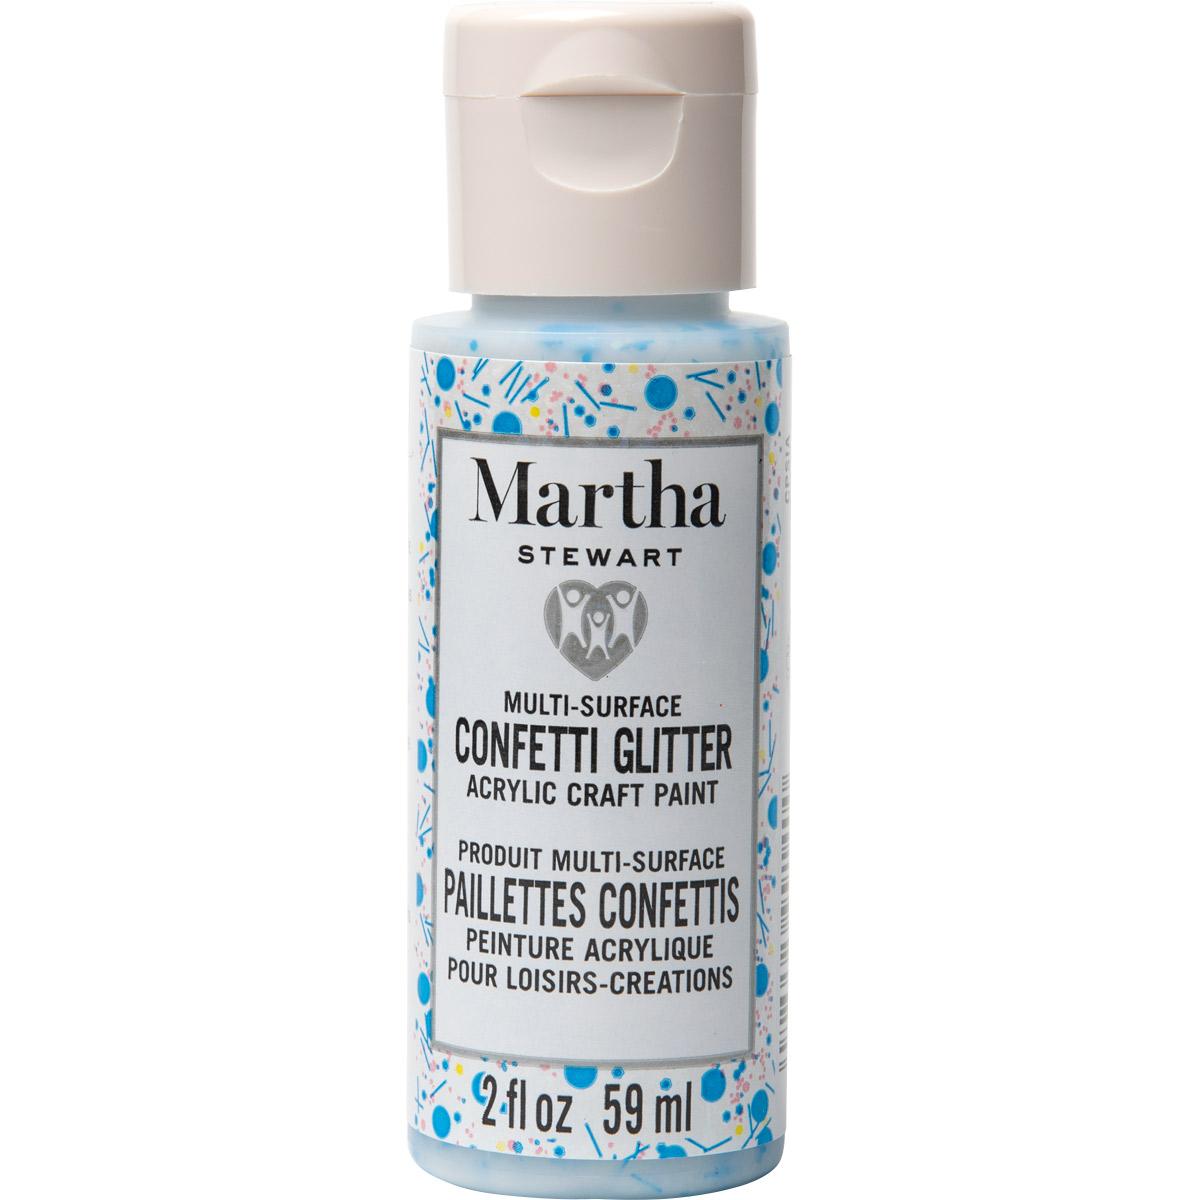 Martha Stewart ® Multi-Surface Confetti Glitter Acrylic Craft Paint CPSIA - Sapphire Celebrations, 2